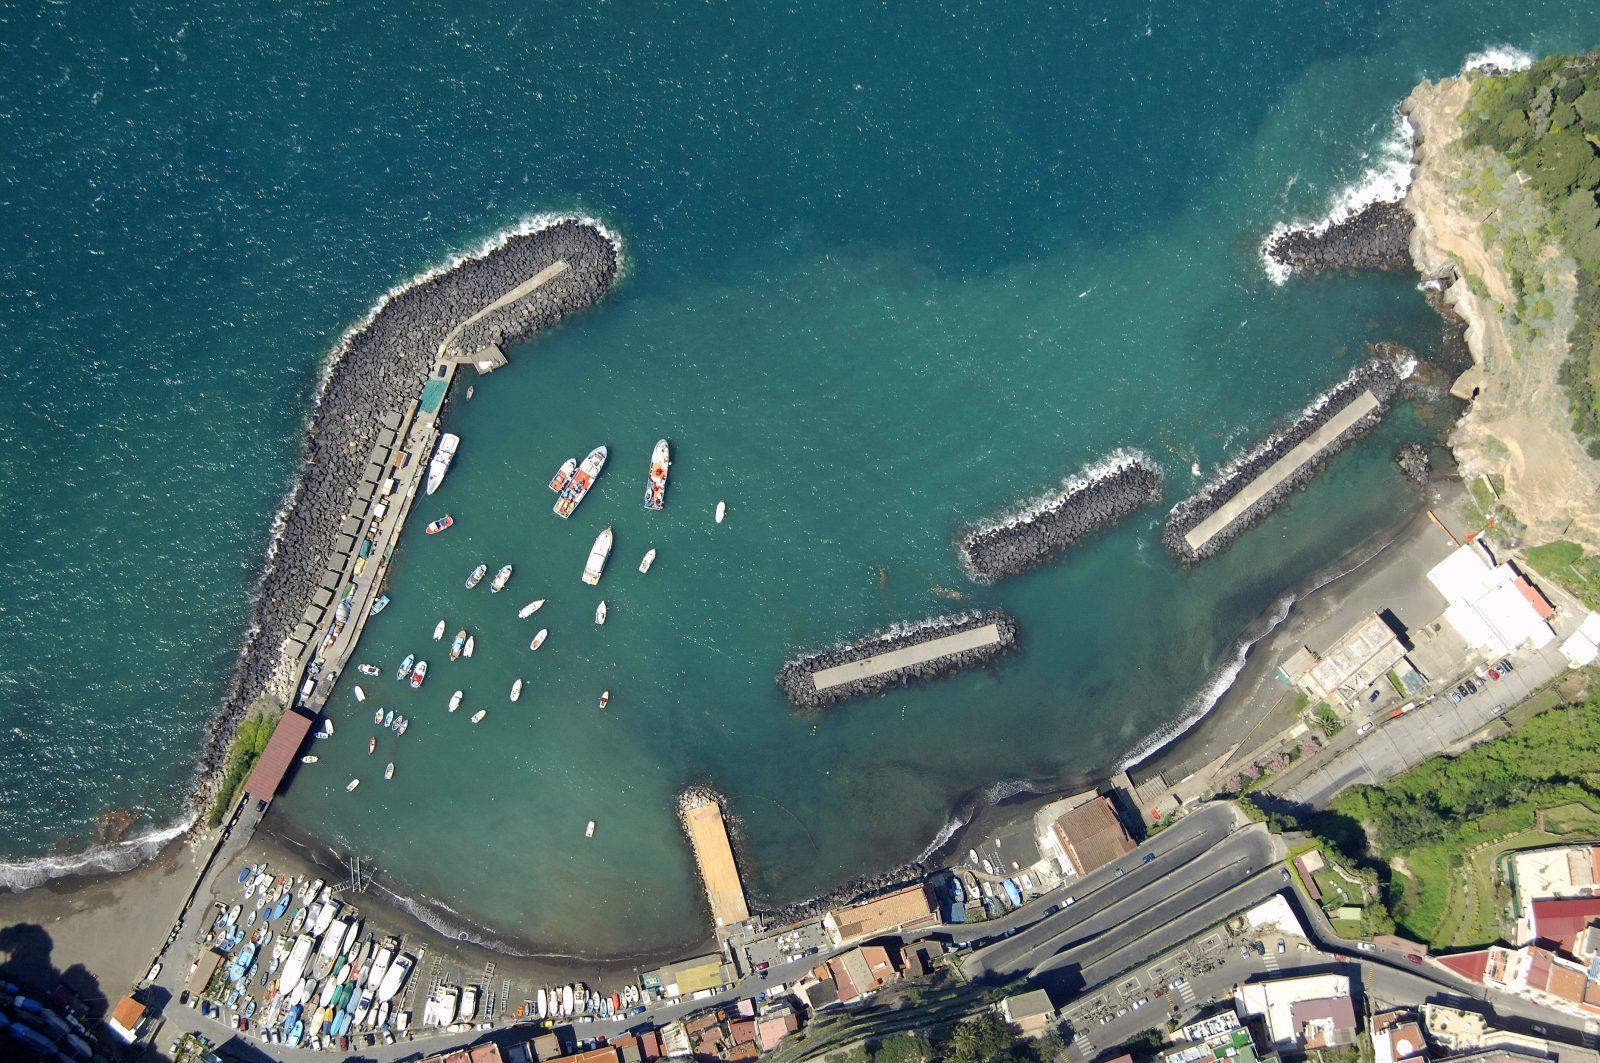 Marina di Cassano beach